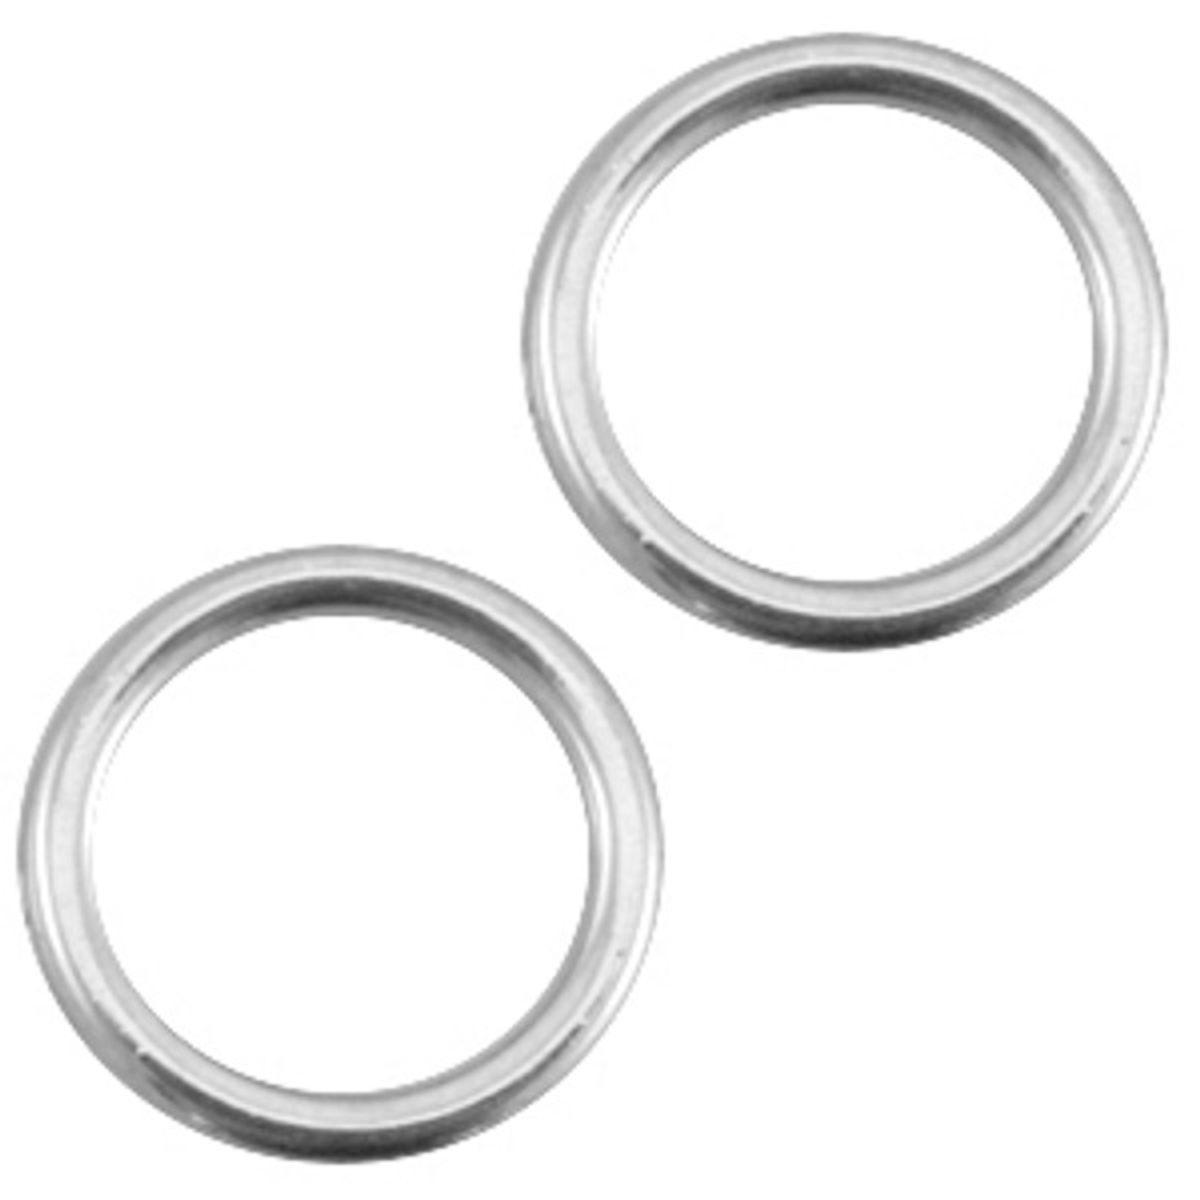 DQ Metallring - 2 Stück - Ø 13 mm